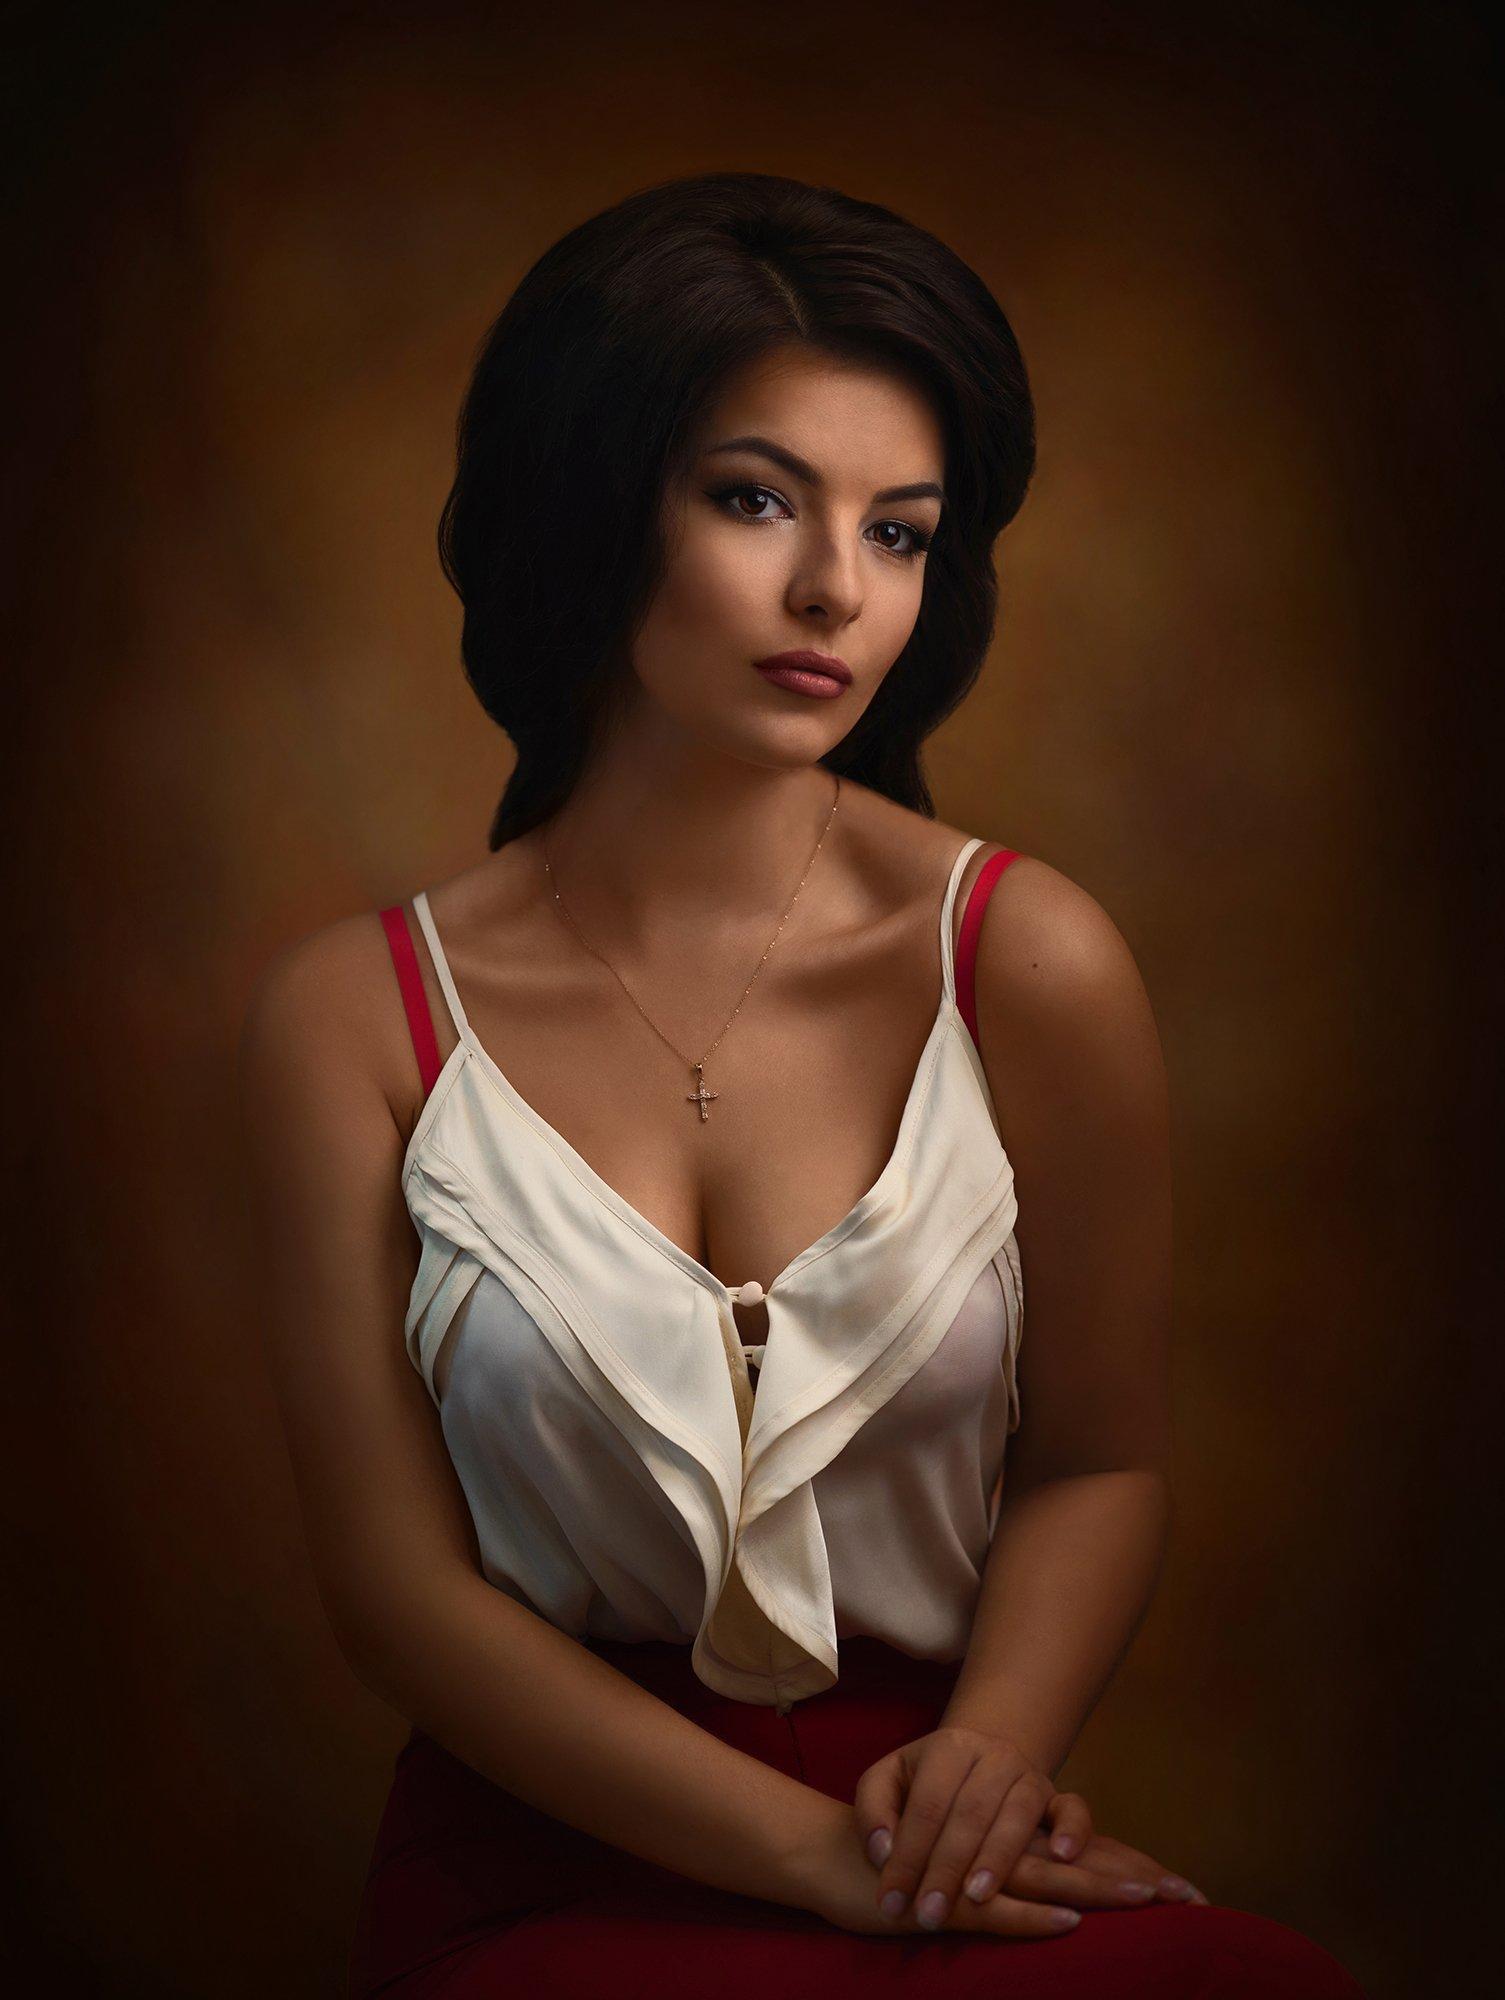 девушка, студия, портрет, взгляд, Рембрандт, Александр Жосан